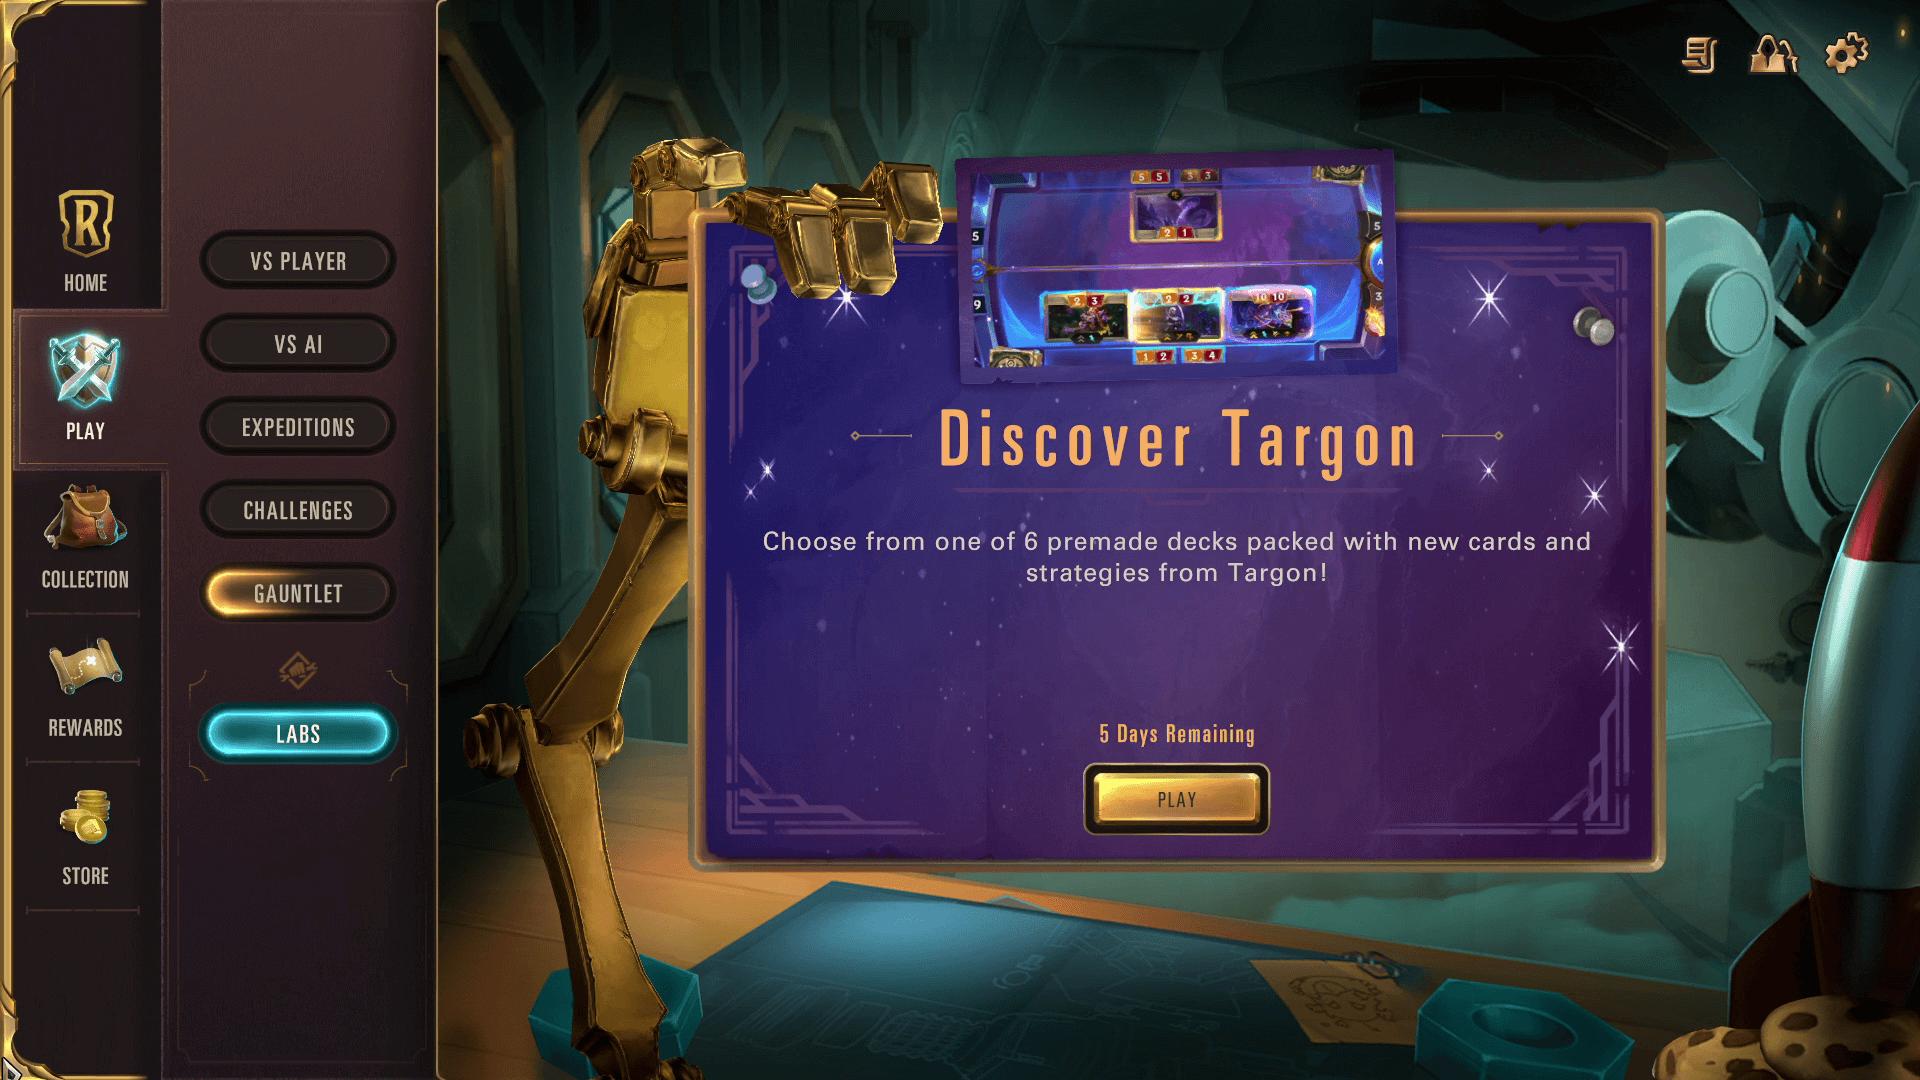 Discover_Targon_en_us.png